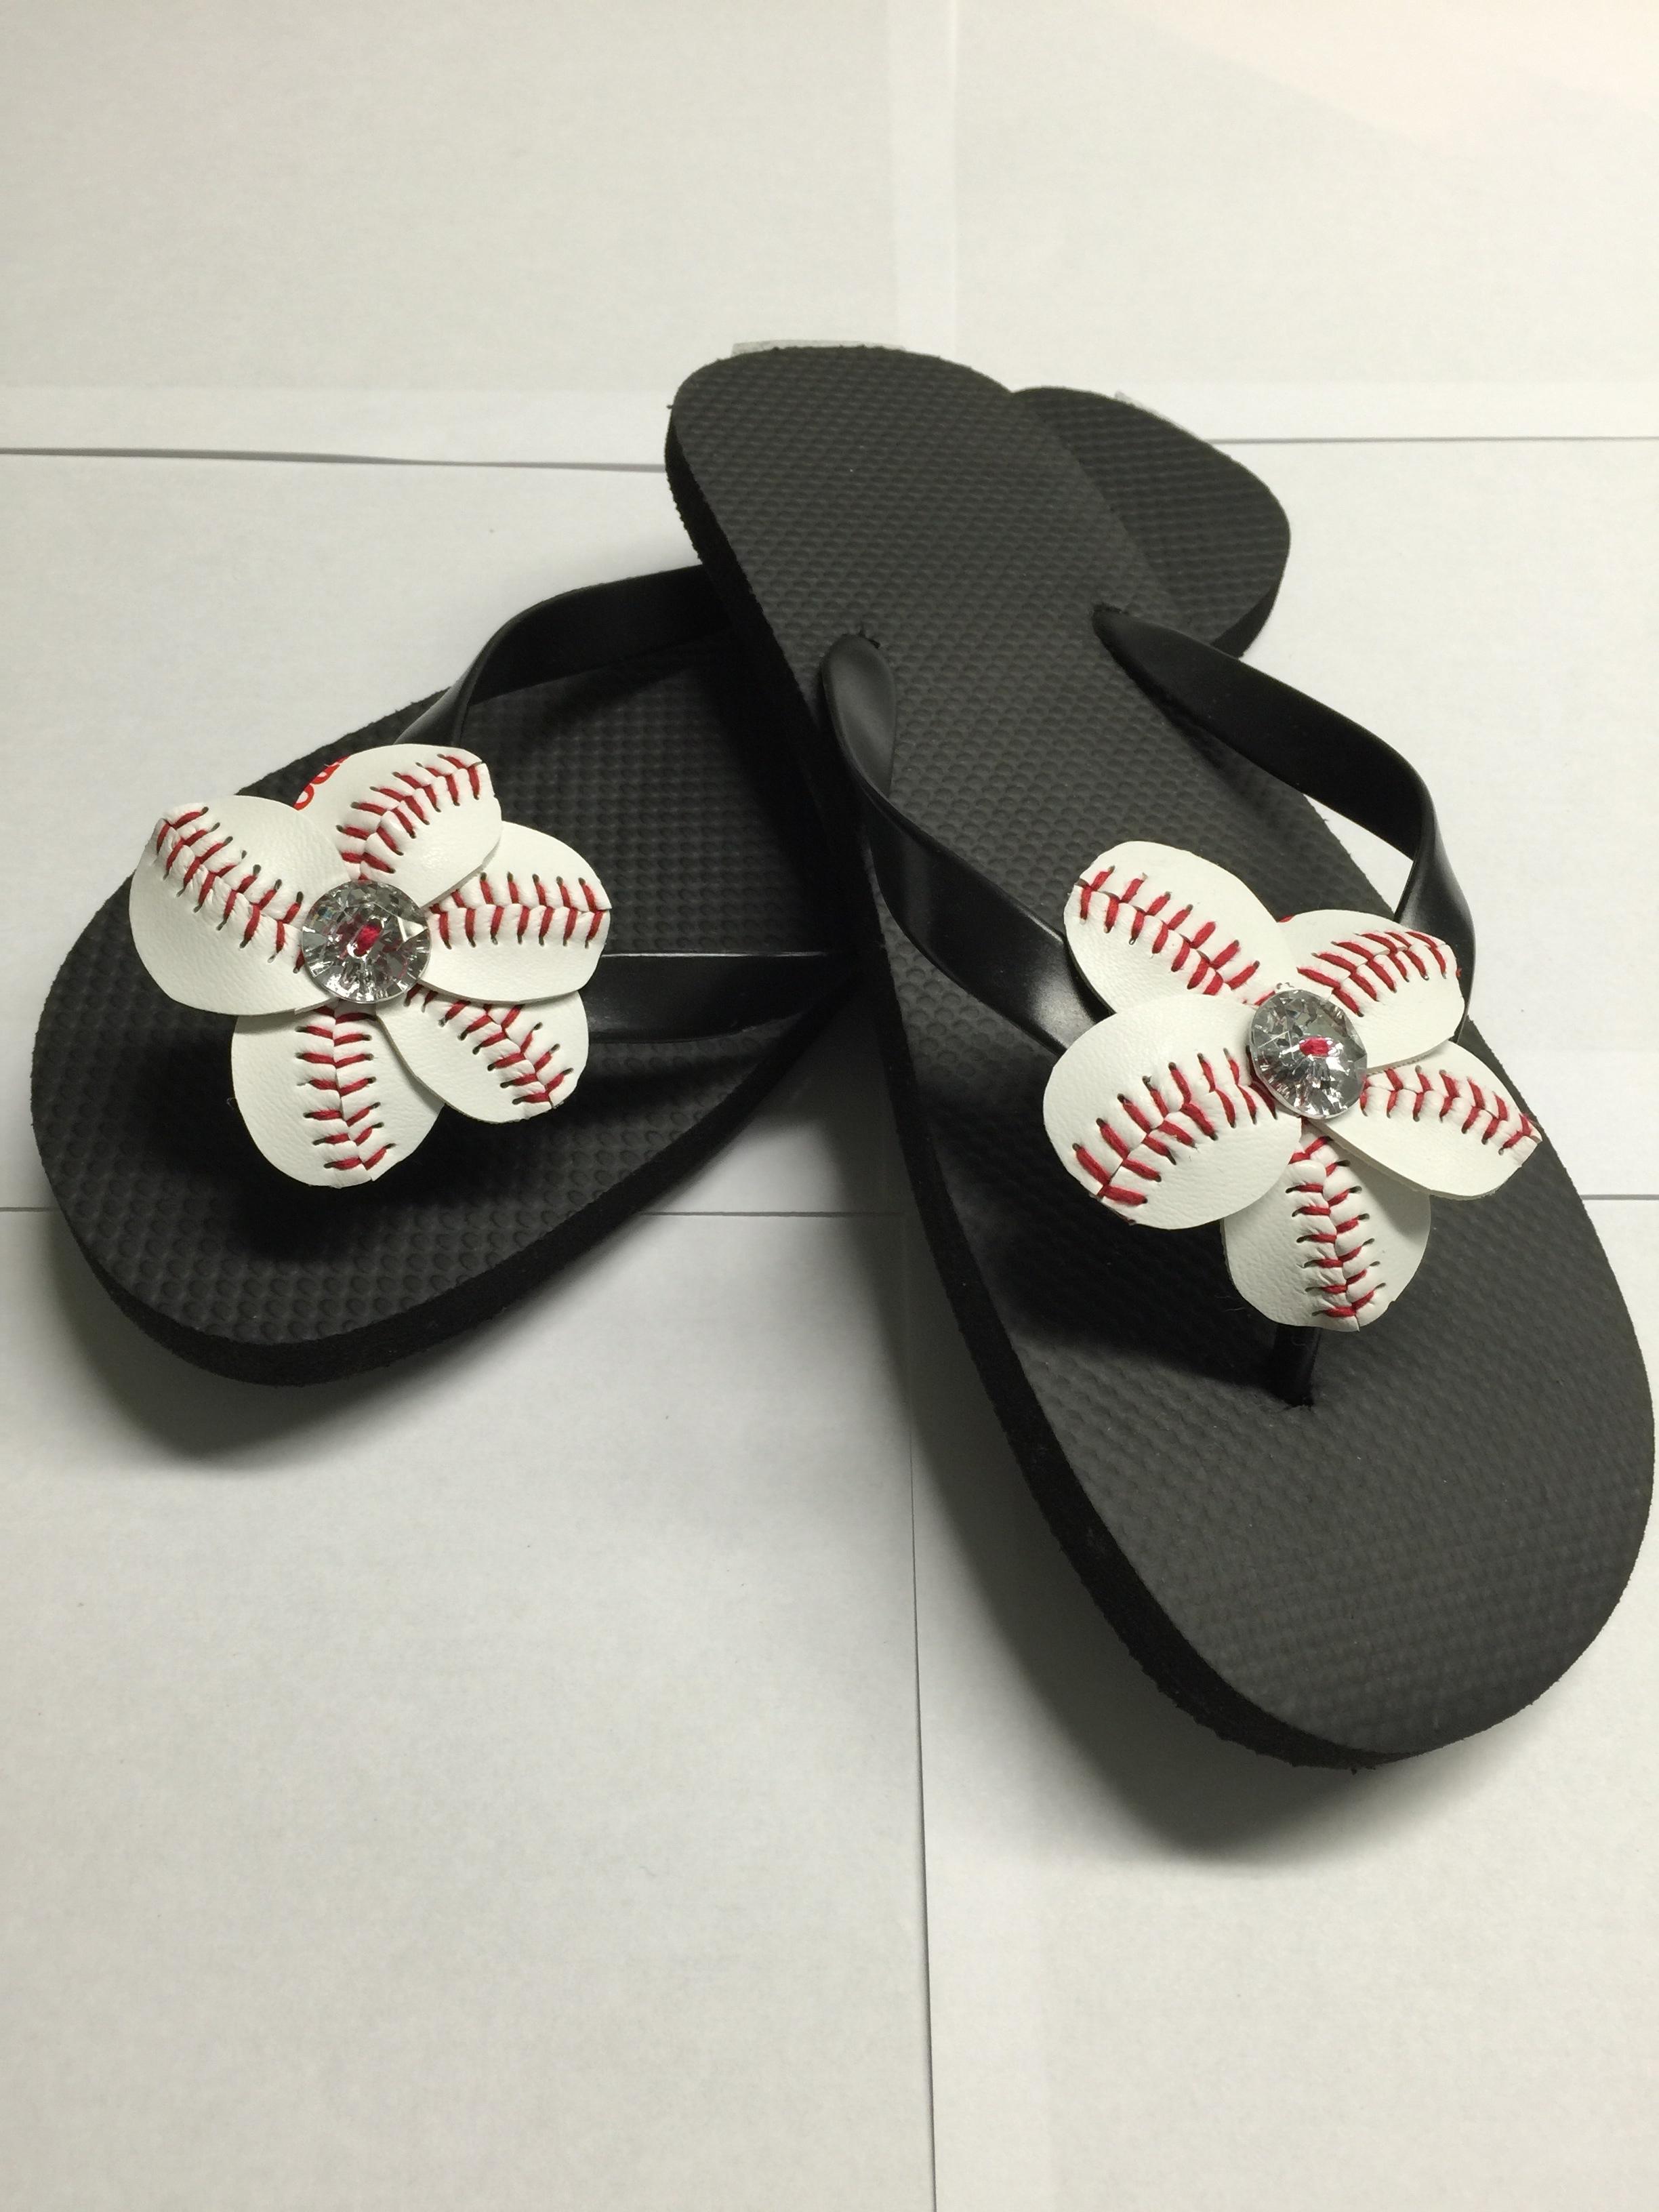 65e04311a Baseball or Softball Flower Flip Flops - includes flip flops · Paper ...